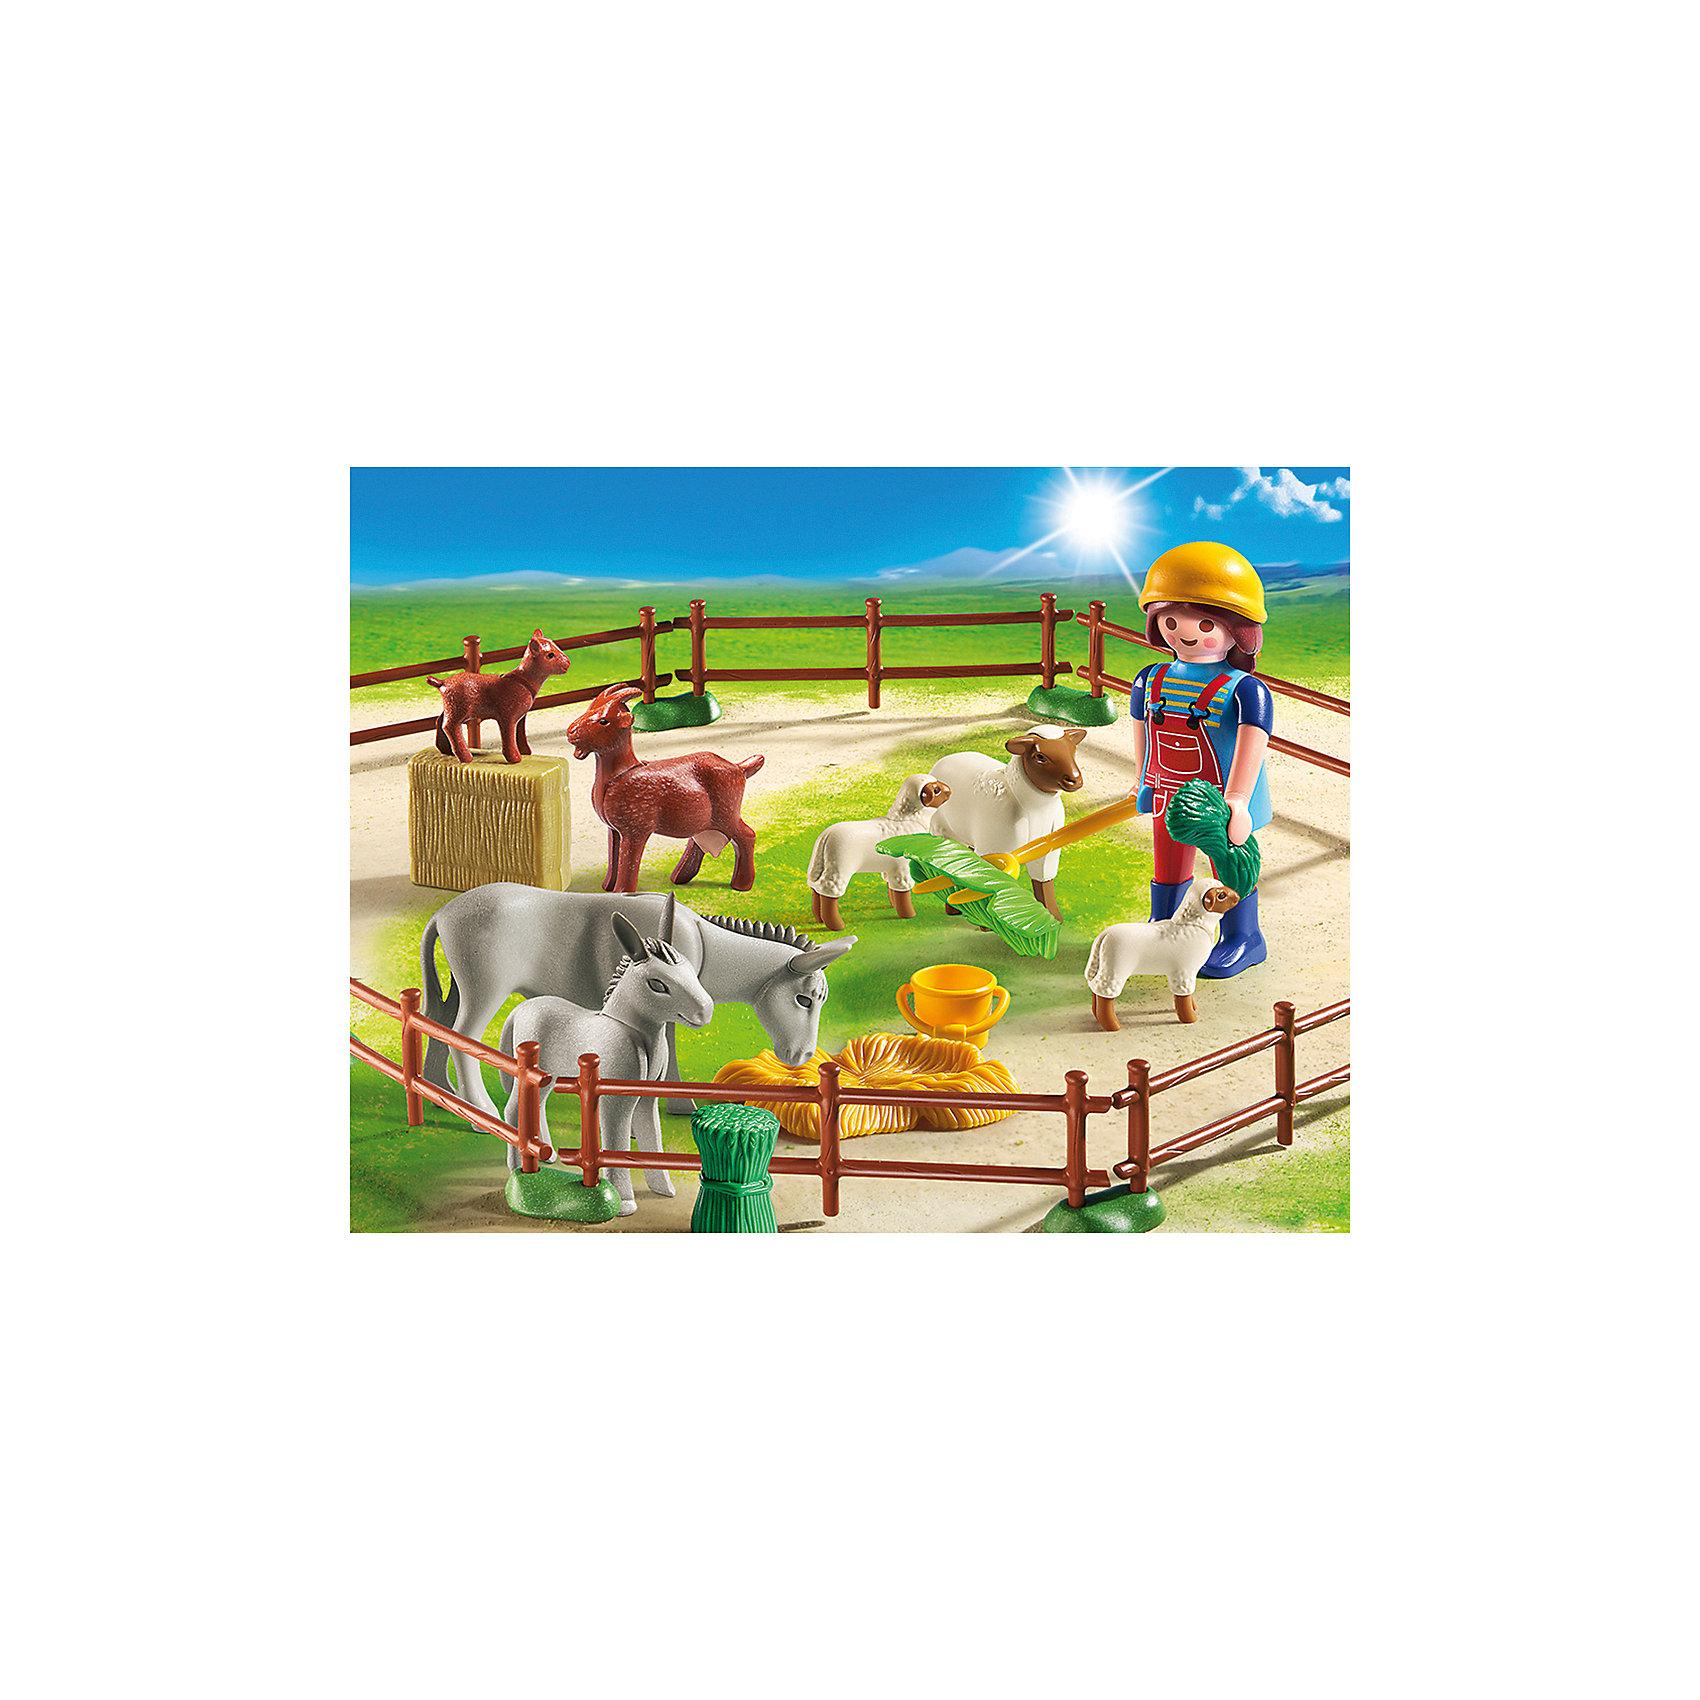 PLAYMOBIL® Фермер с домашними животными, PLAYMOBIL playmobil спасатели с носилками